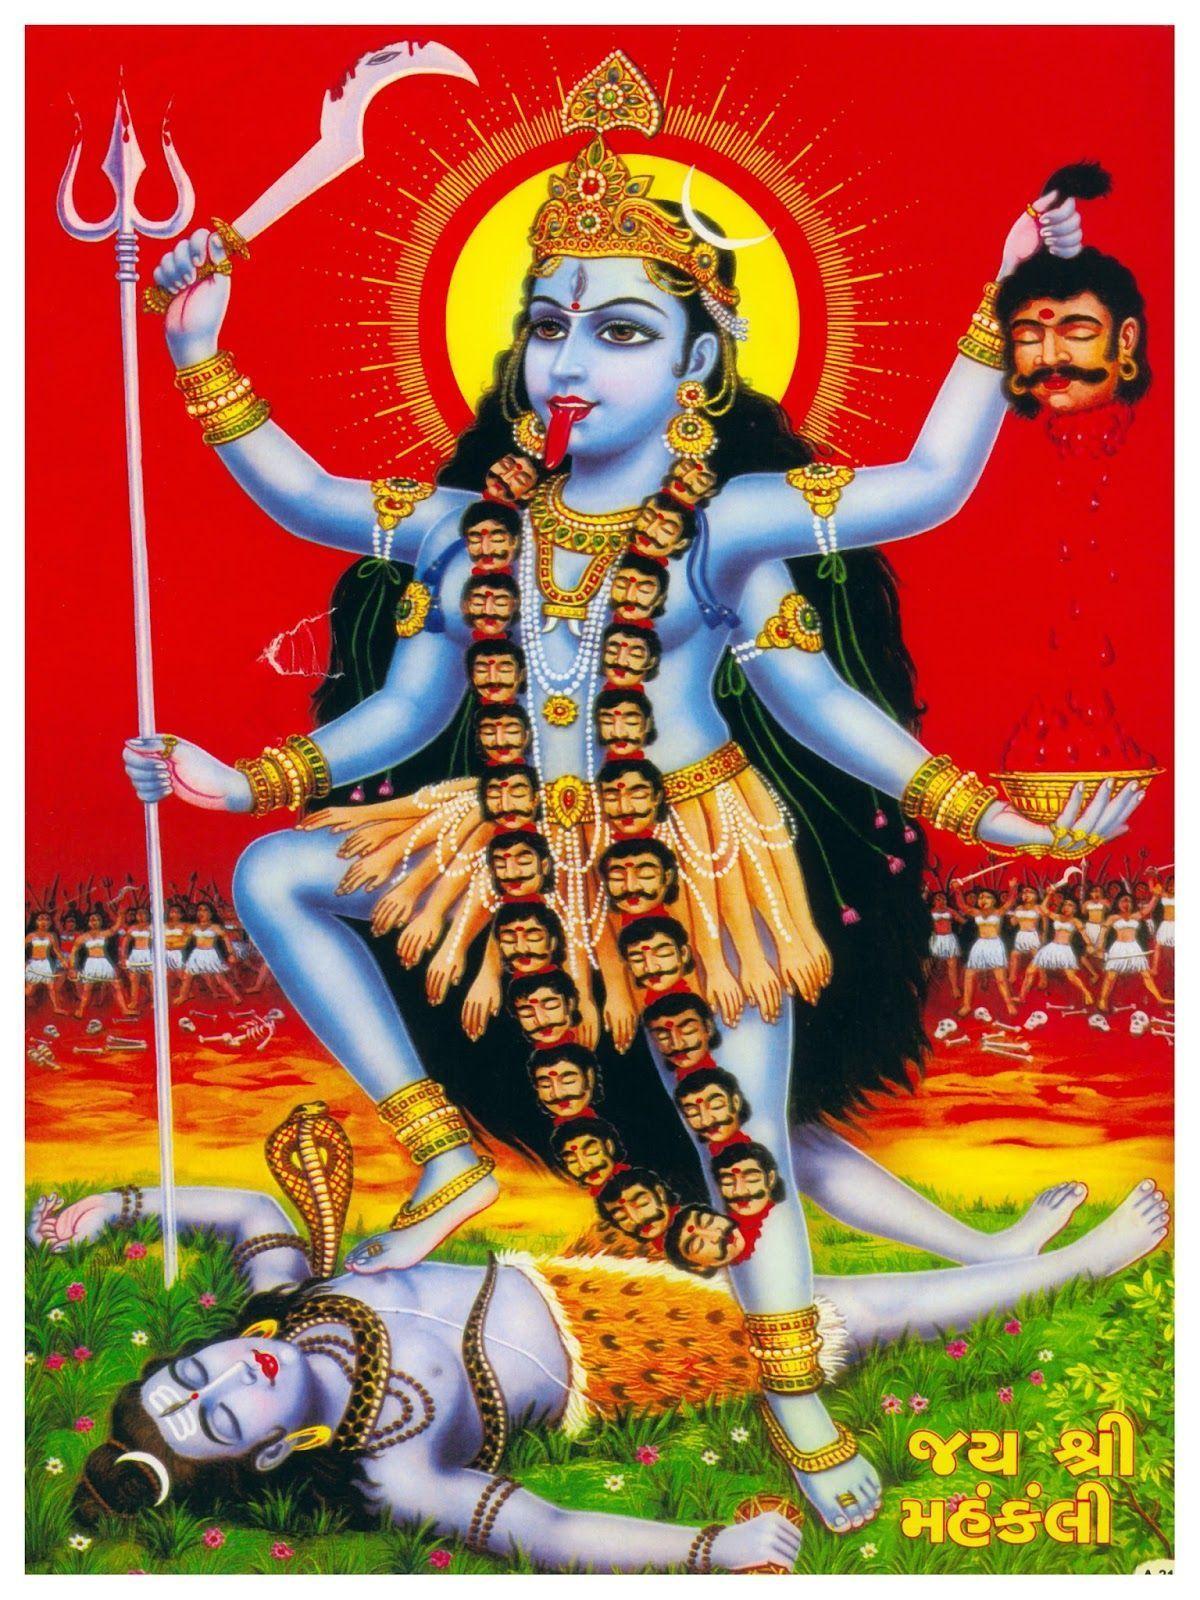 New Year Pujas Kali Goddess Hindu Gods Kali Mata